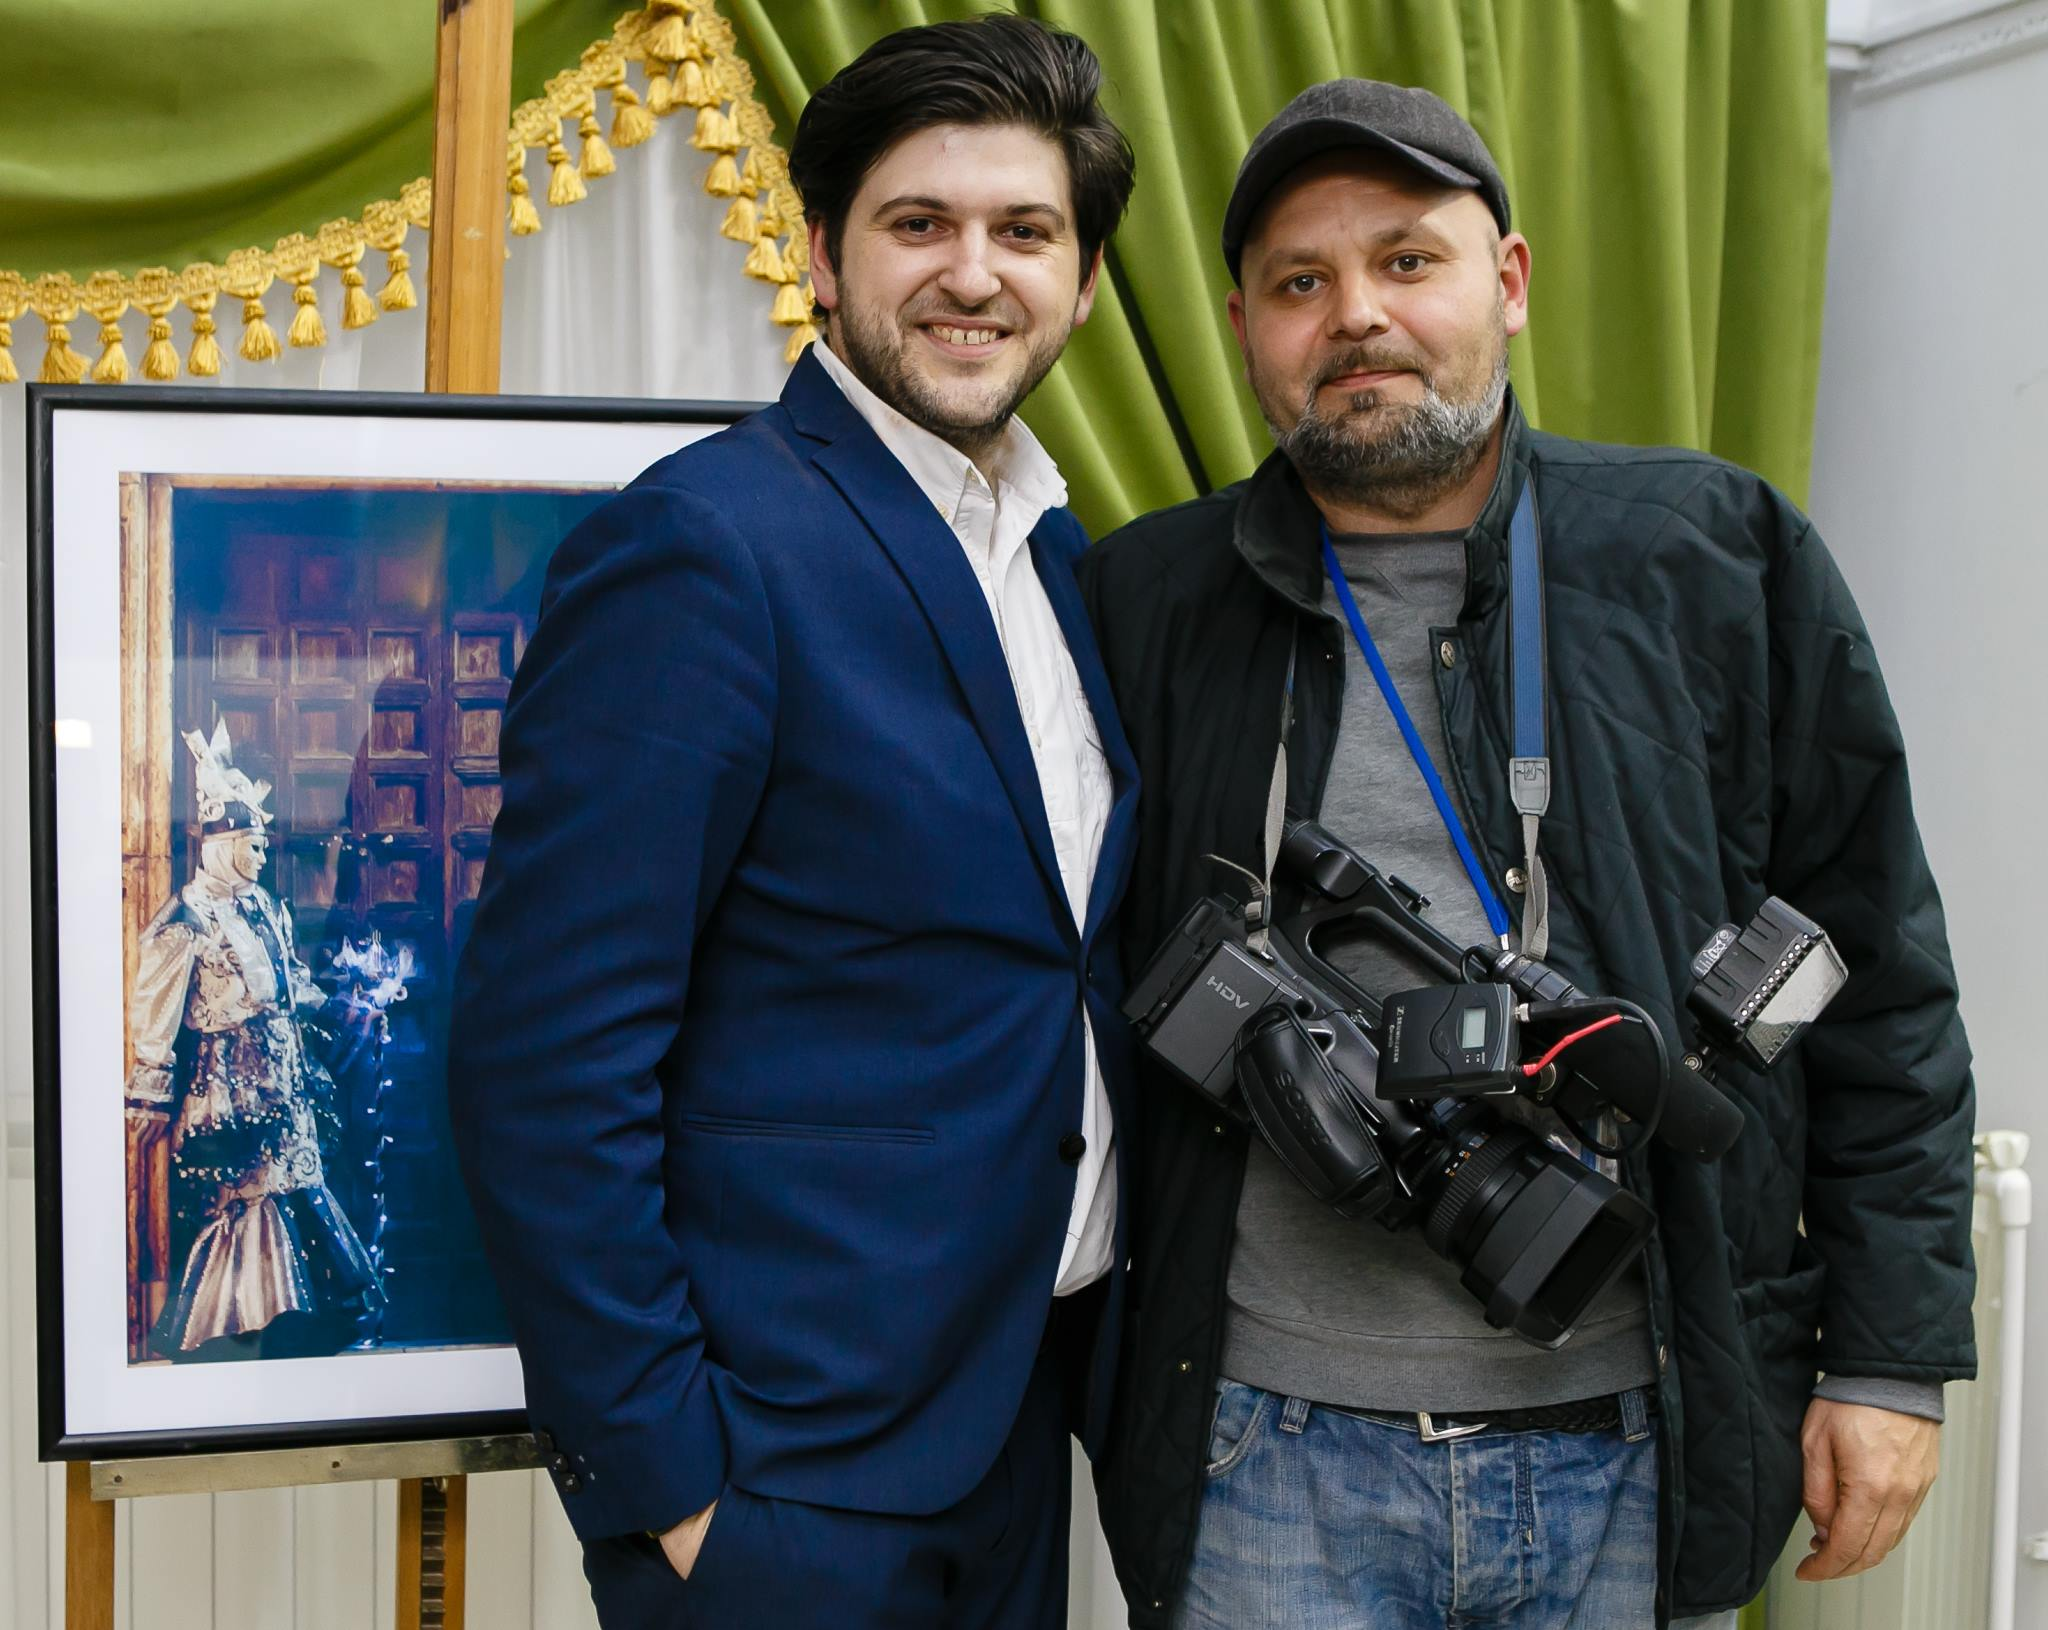 Vernisaj Expozitie de Fotografie Povesti Venetiene Paul Padurariu fotograf profesionist Iasi - fotografie cameraman